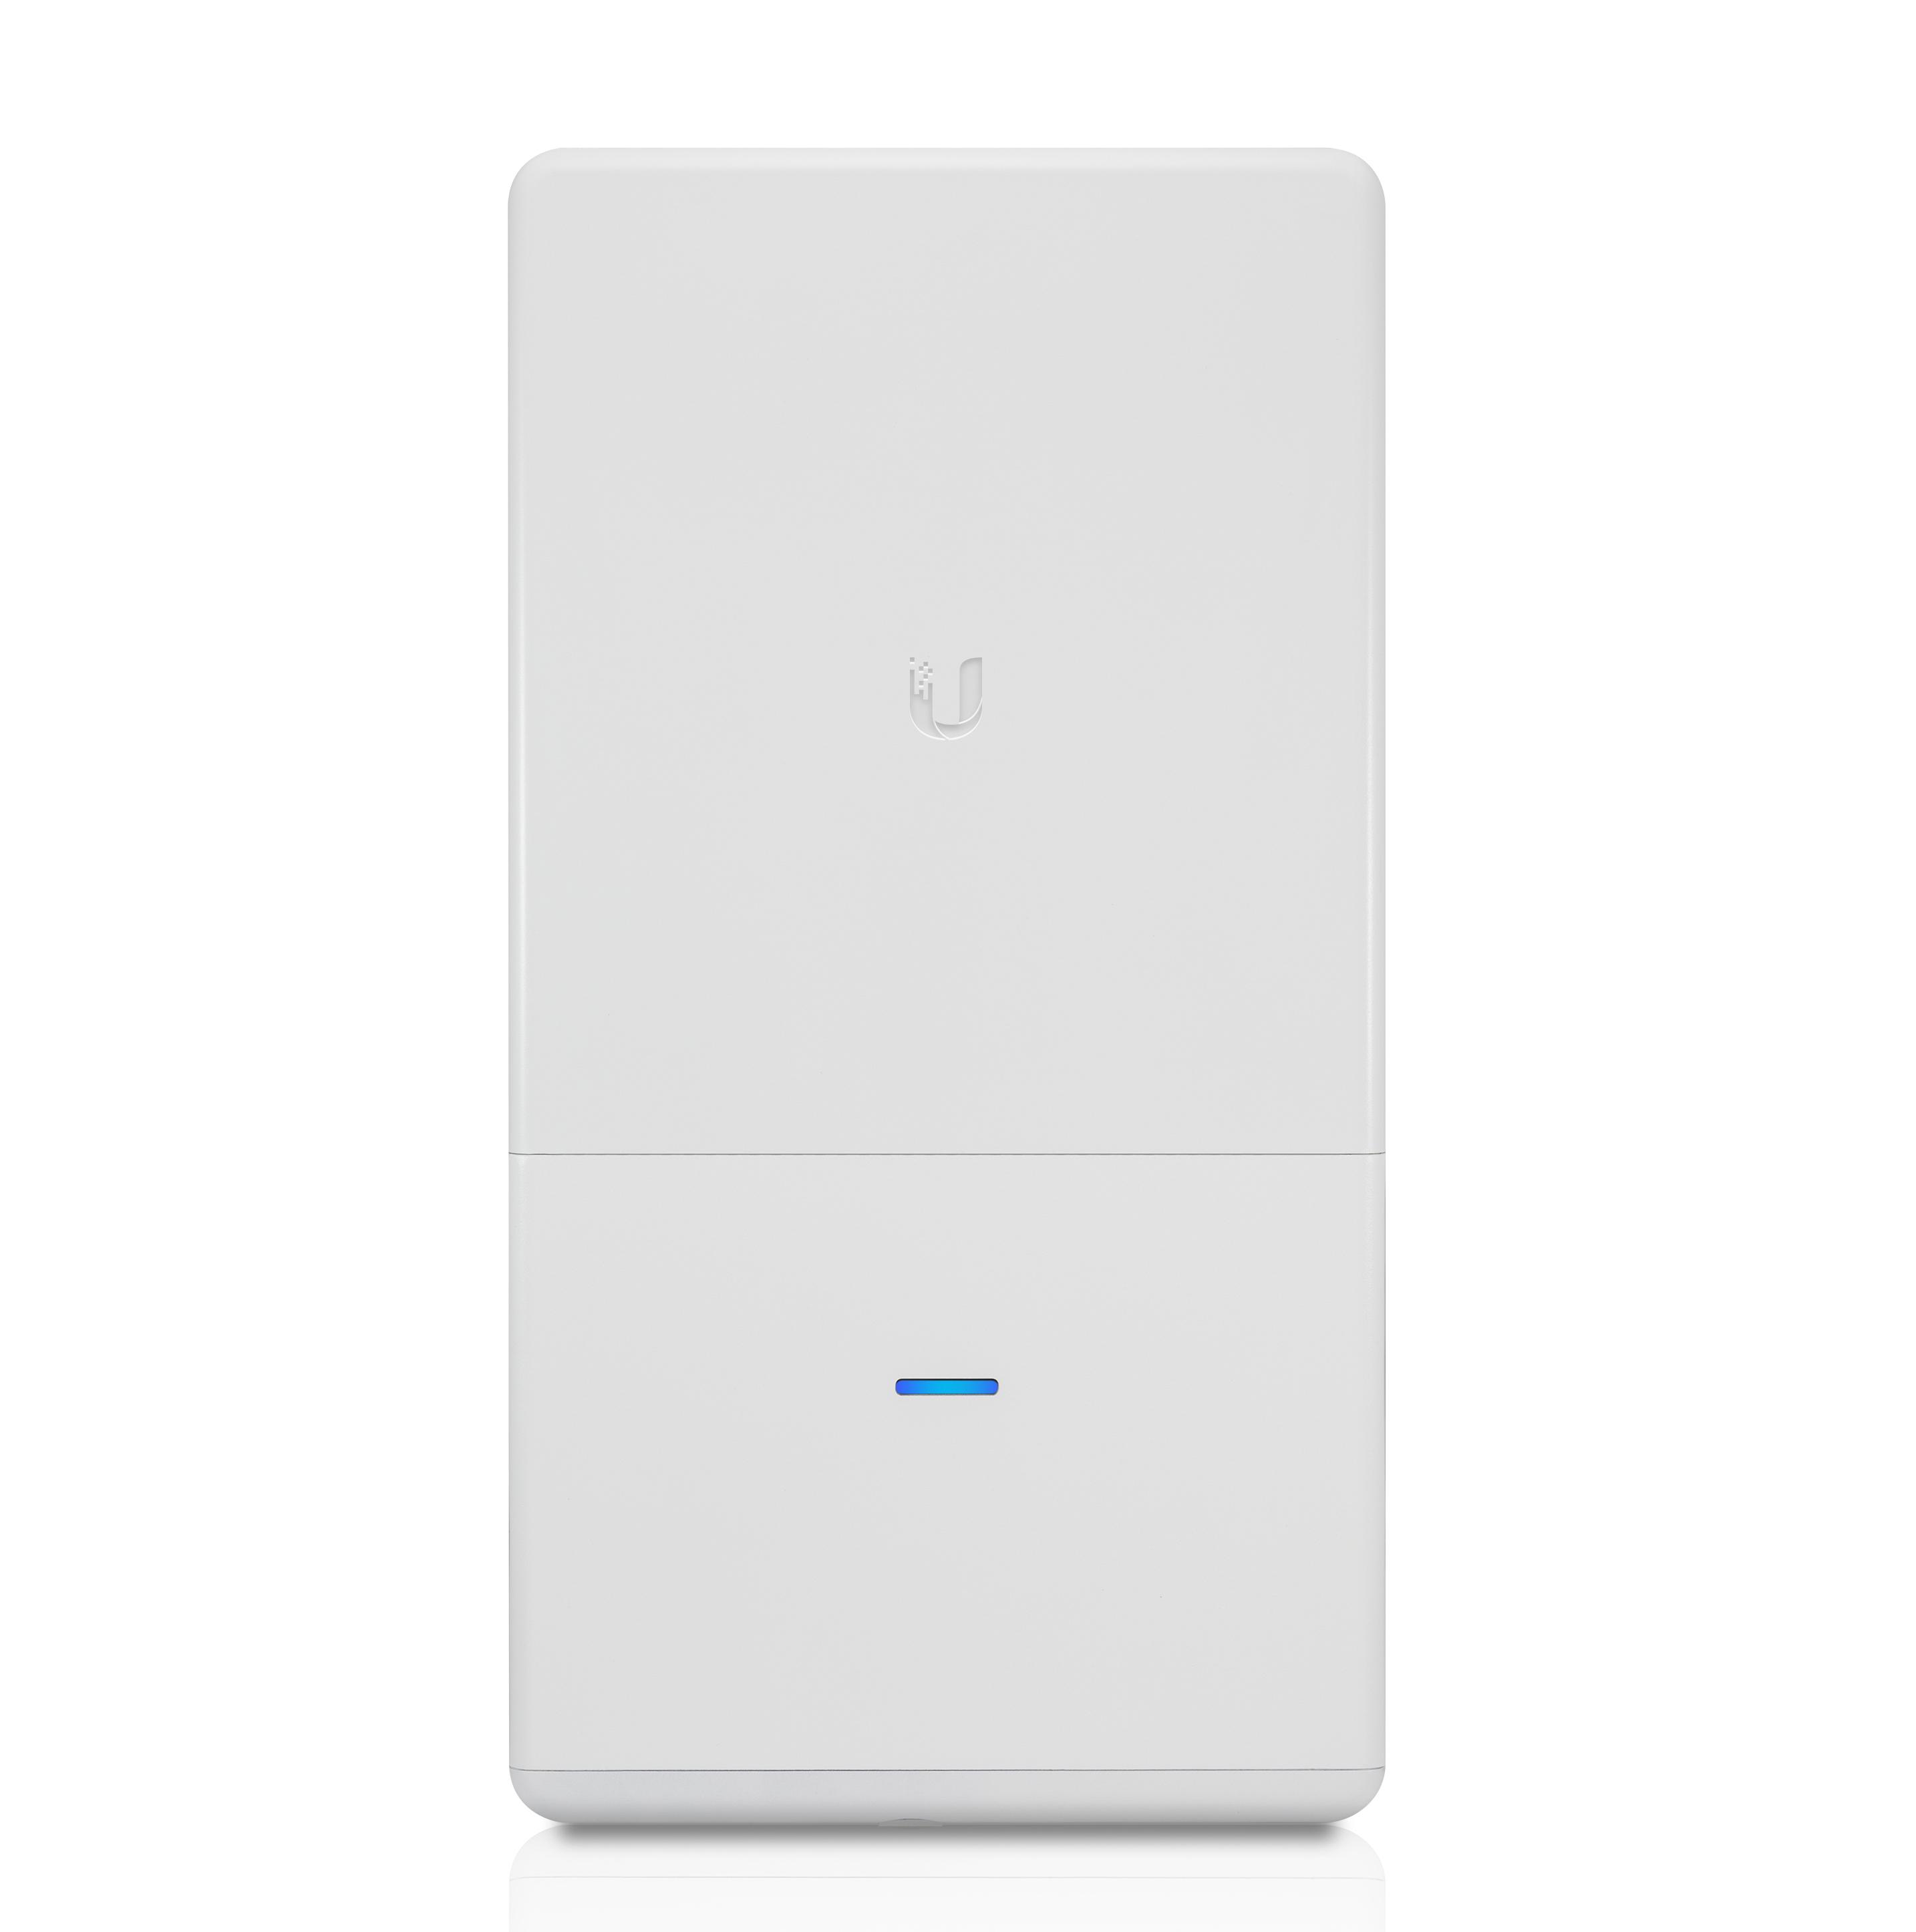 Ubiquiti Networks Unifi AP AC OUTDOOR Gigabit Ethernet POE+